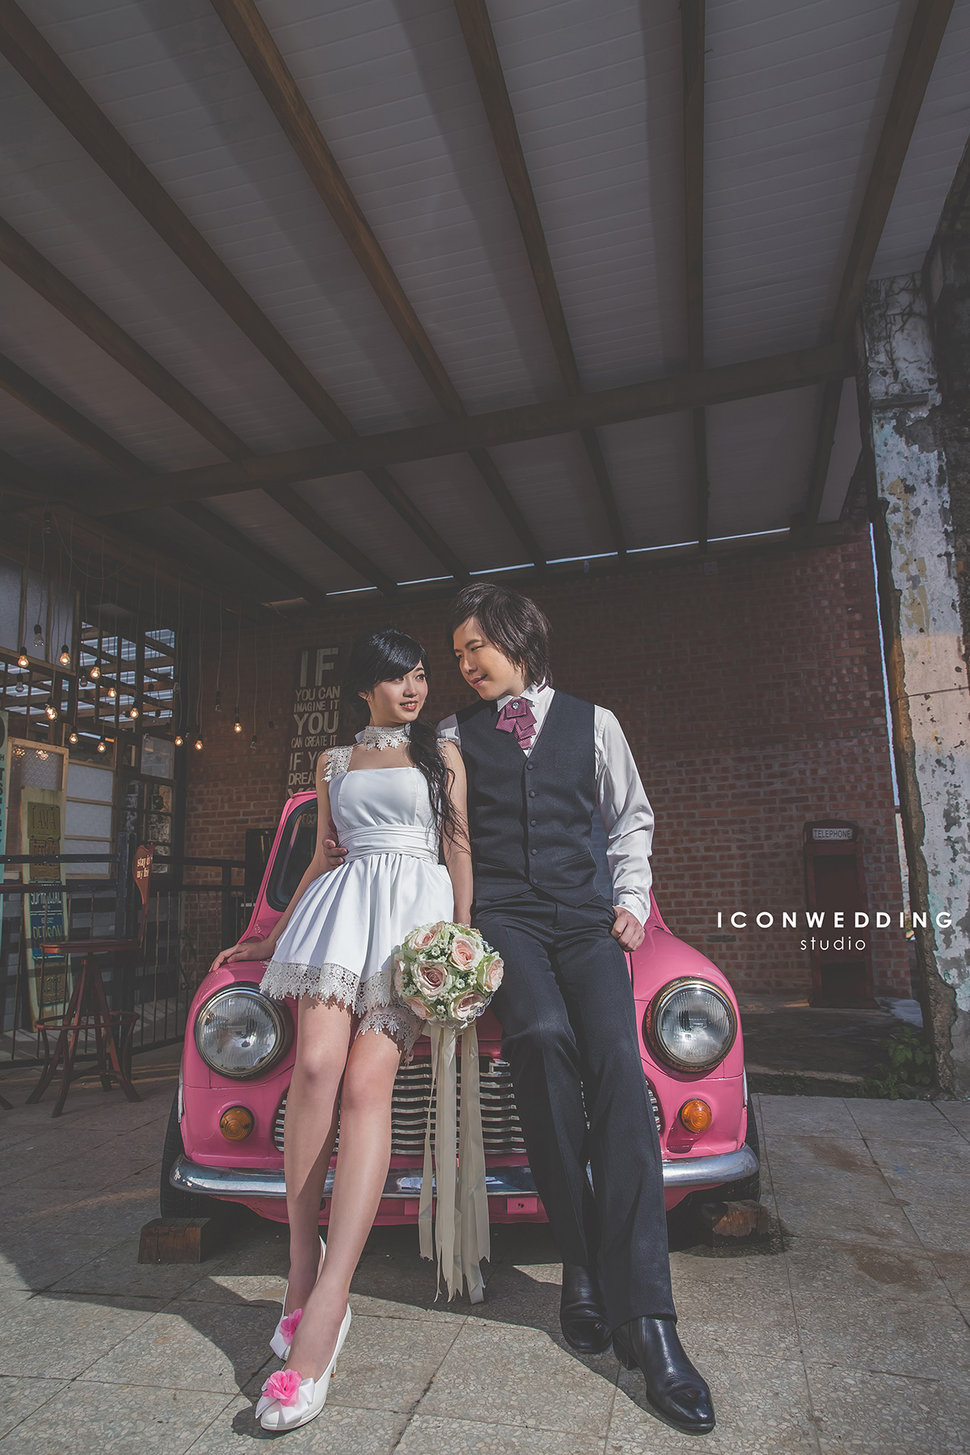 AD7X7234 - 愛情符號 ‧ 玩拍婚紗 ‧ 海外婚紗 - 結婚吧